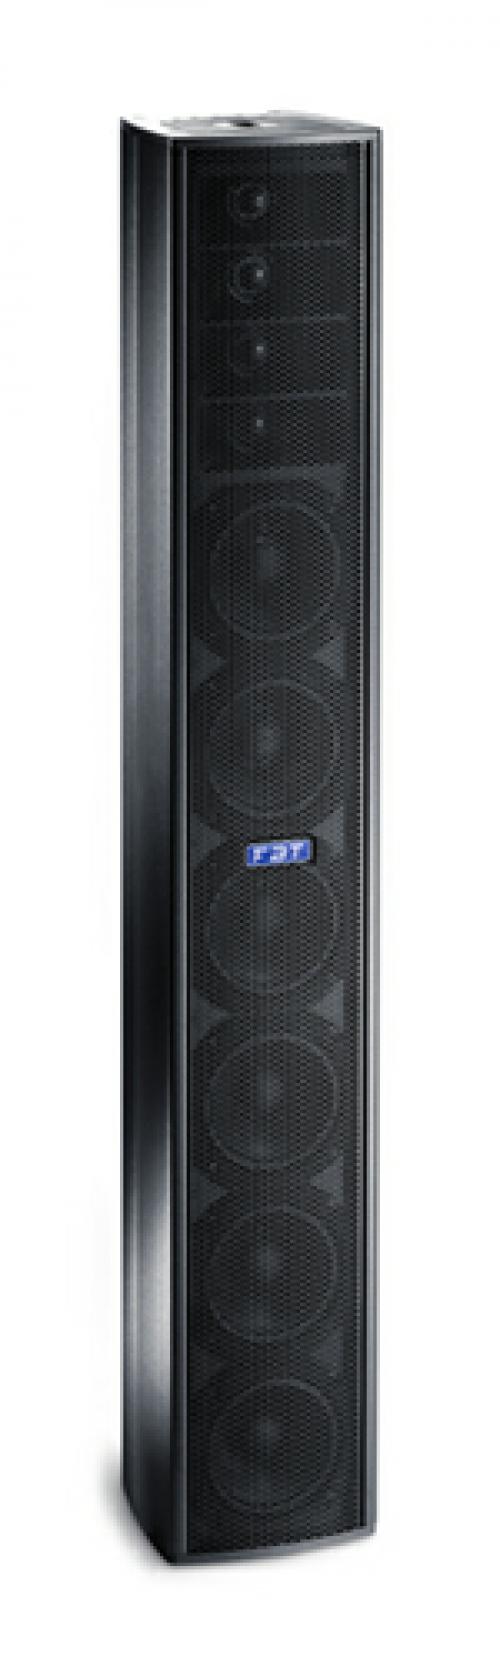 FBT VERTUS CLA604A 400W + 100W RMS 125dB SPL Active Column Line array